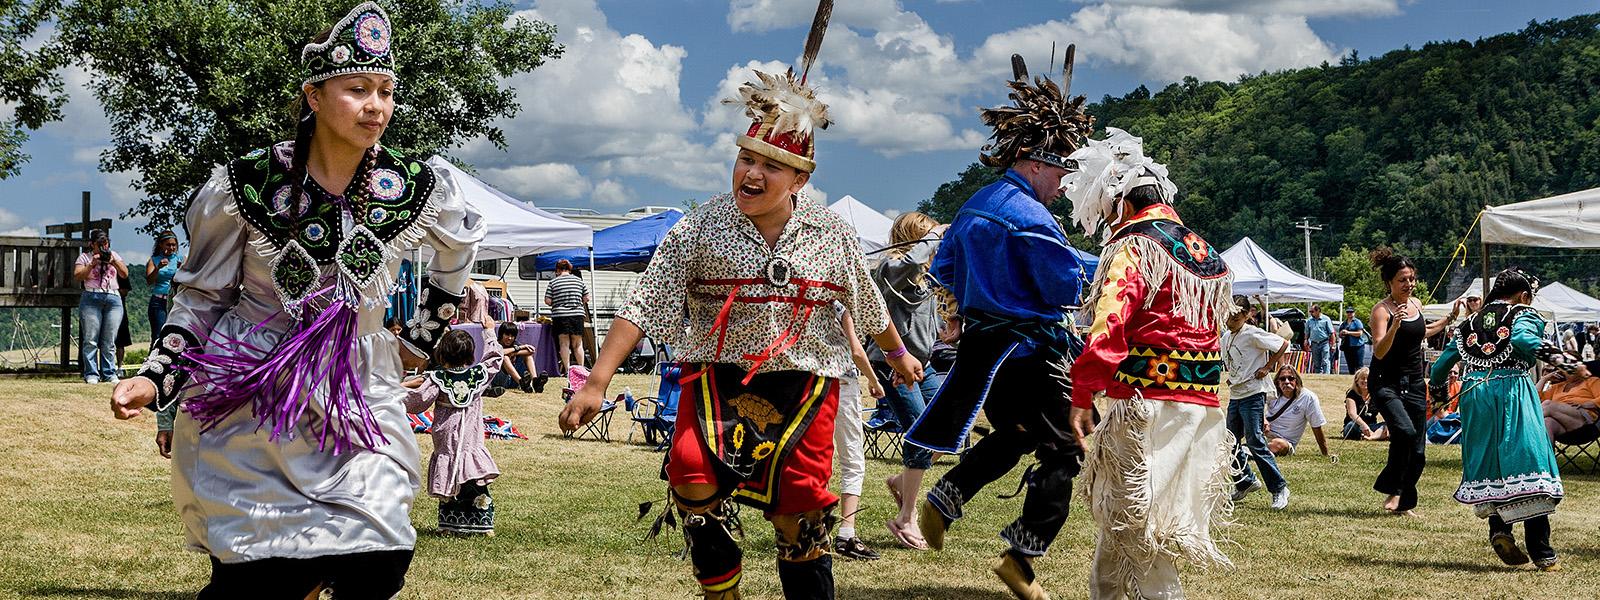 Kanatsiohareke Mohawk Indian Festival, Fonda